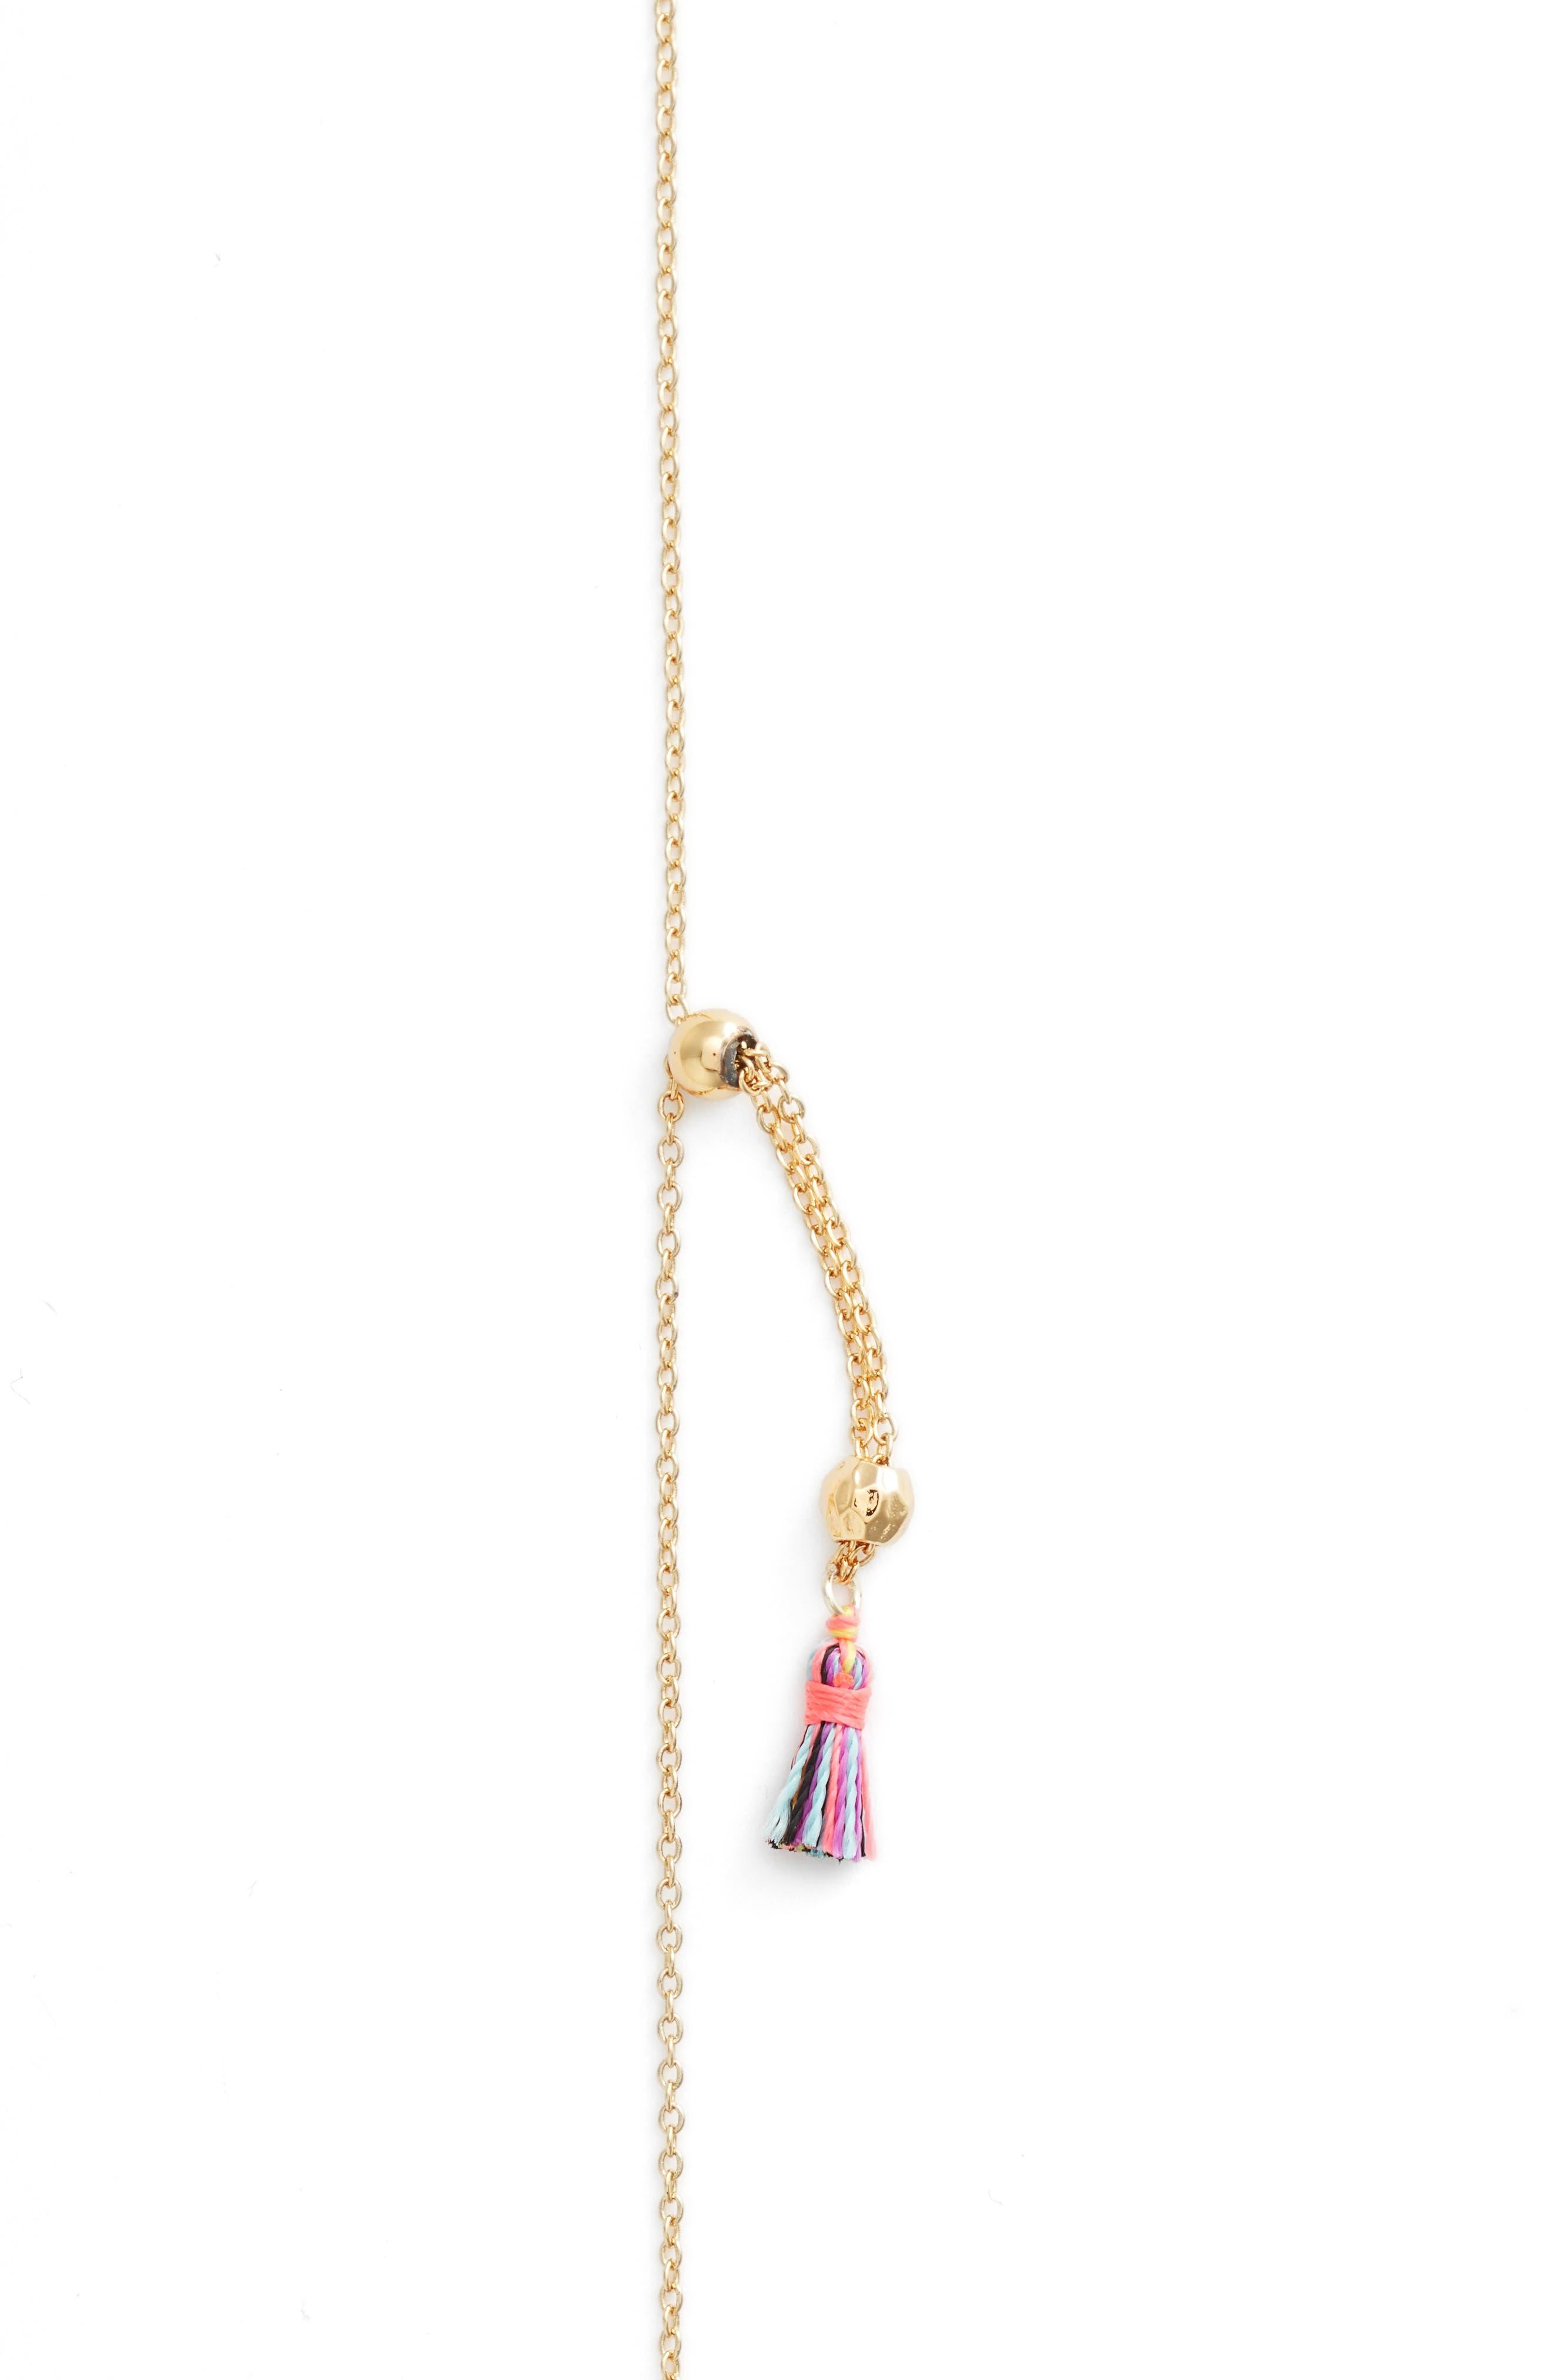 Havana Tassel Adjustable Necklace,                             Alternate thumbnail 3, color,                             TROPIC